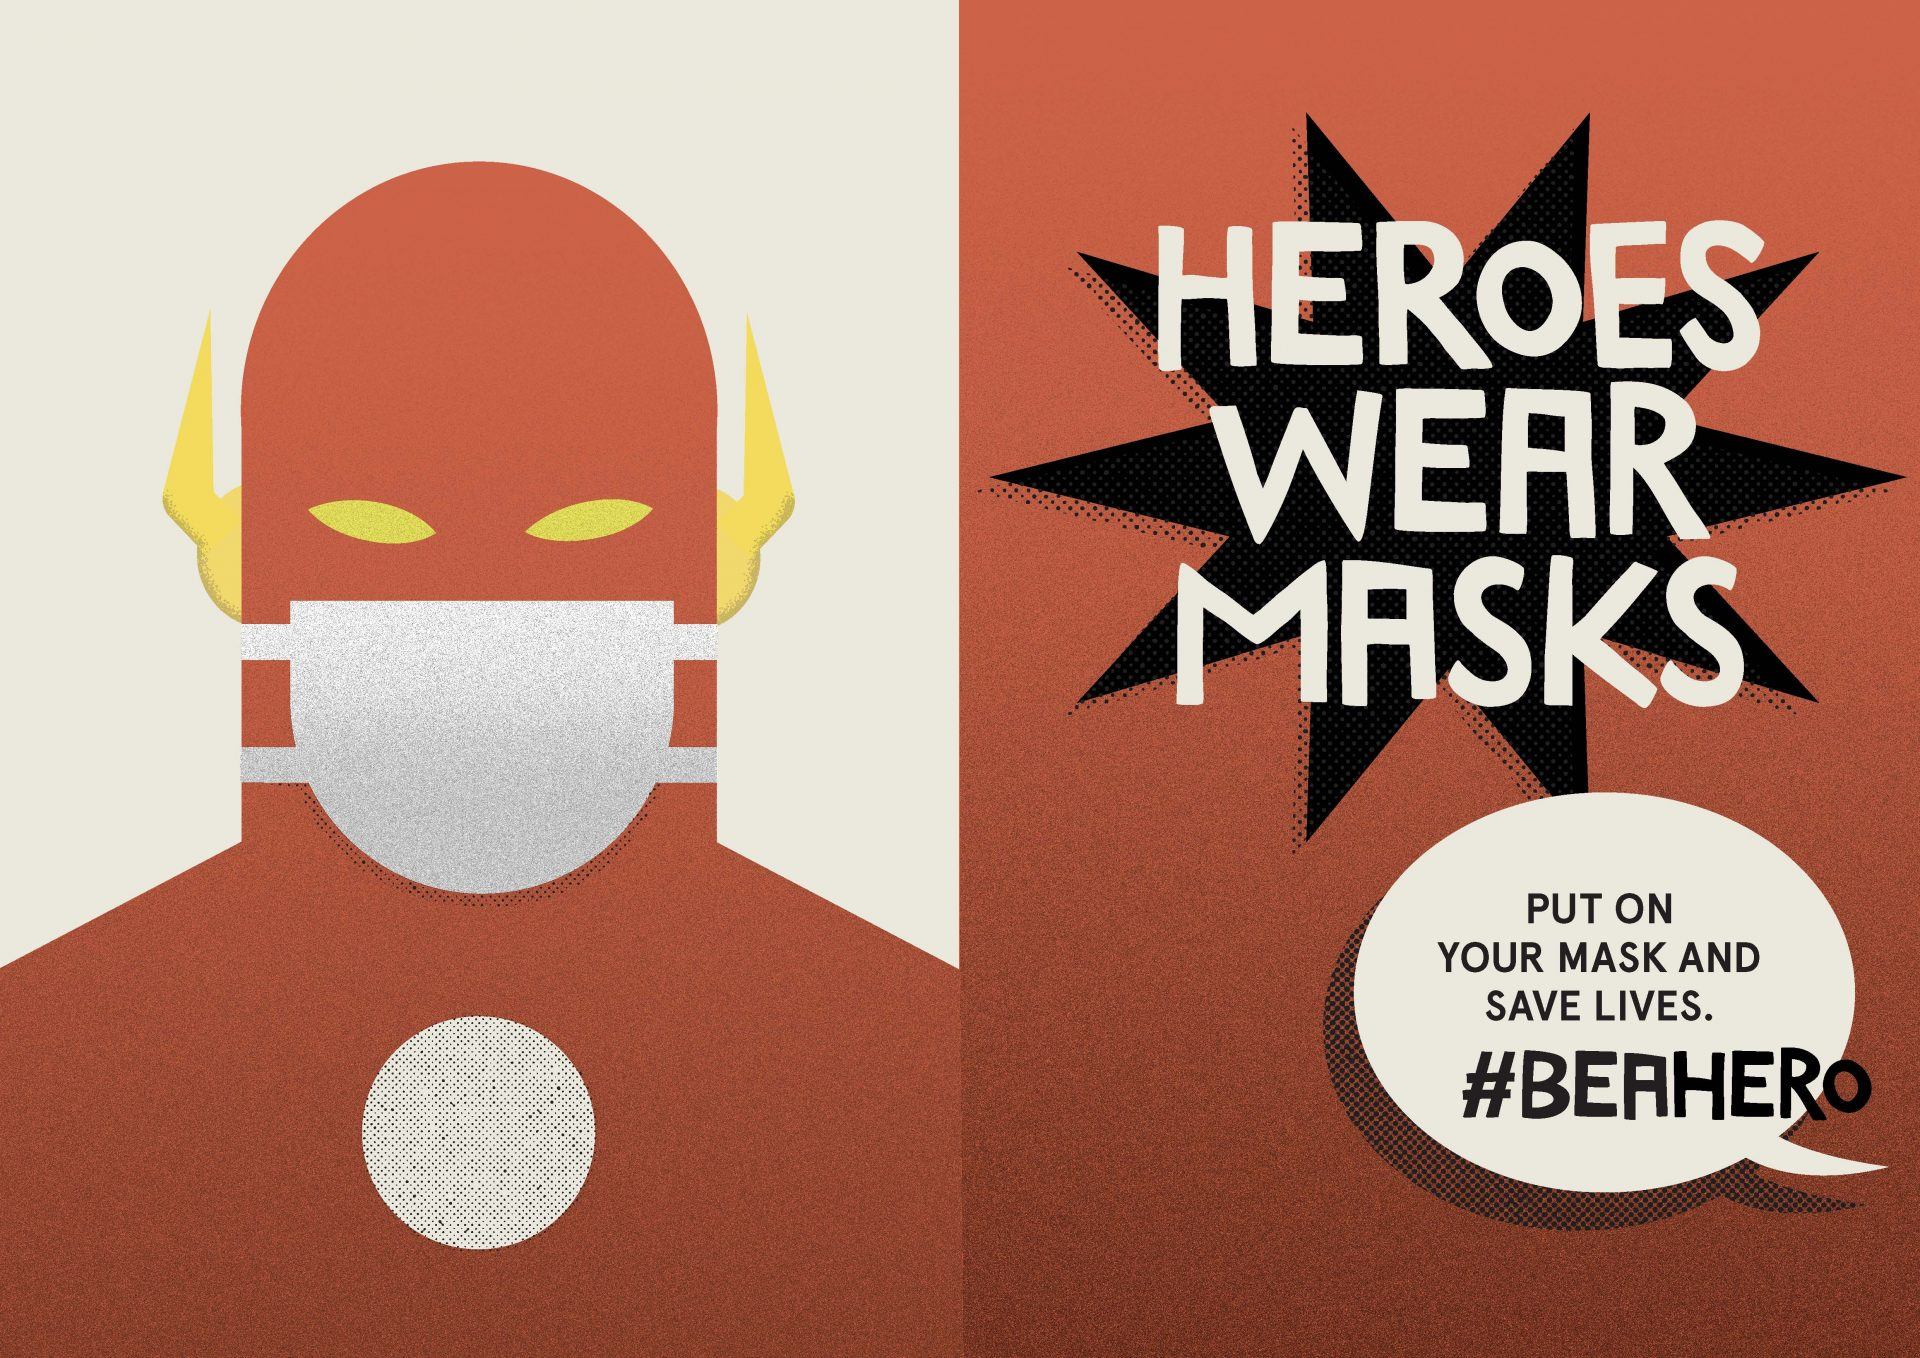 Heroes wear masks. Flash.